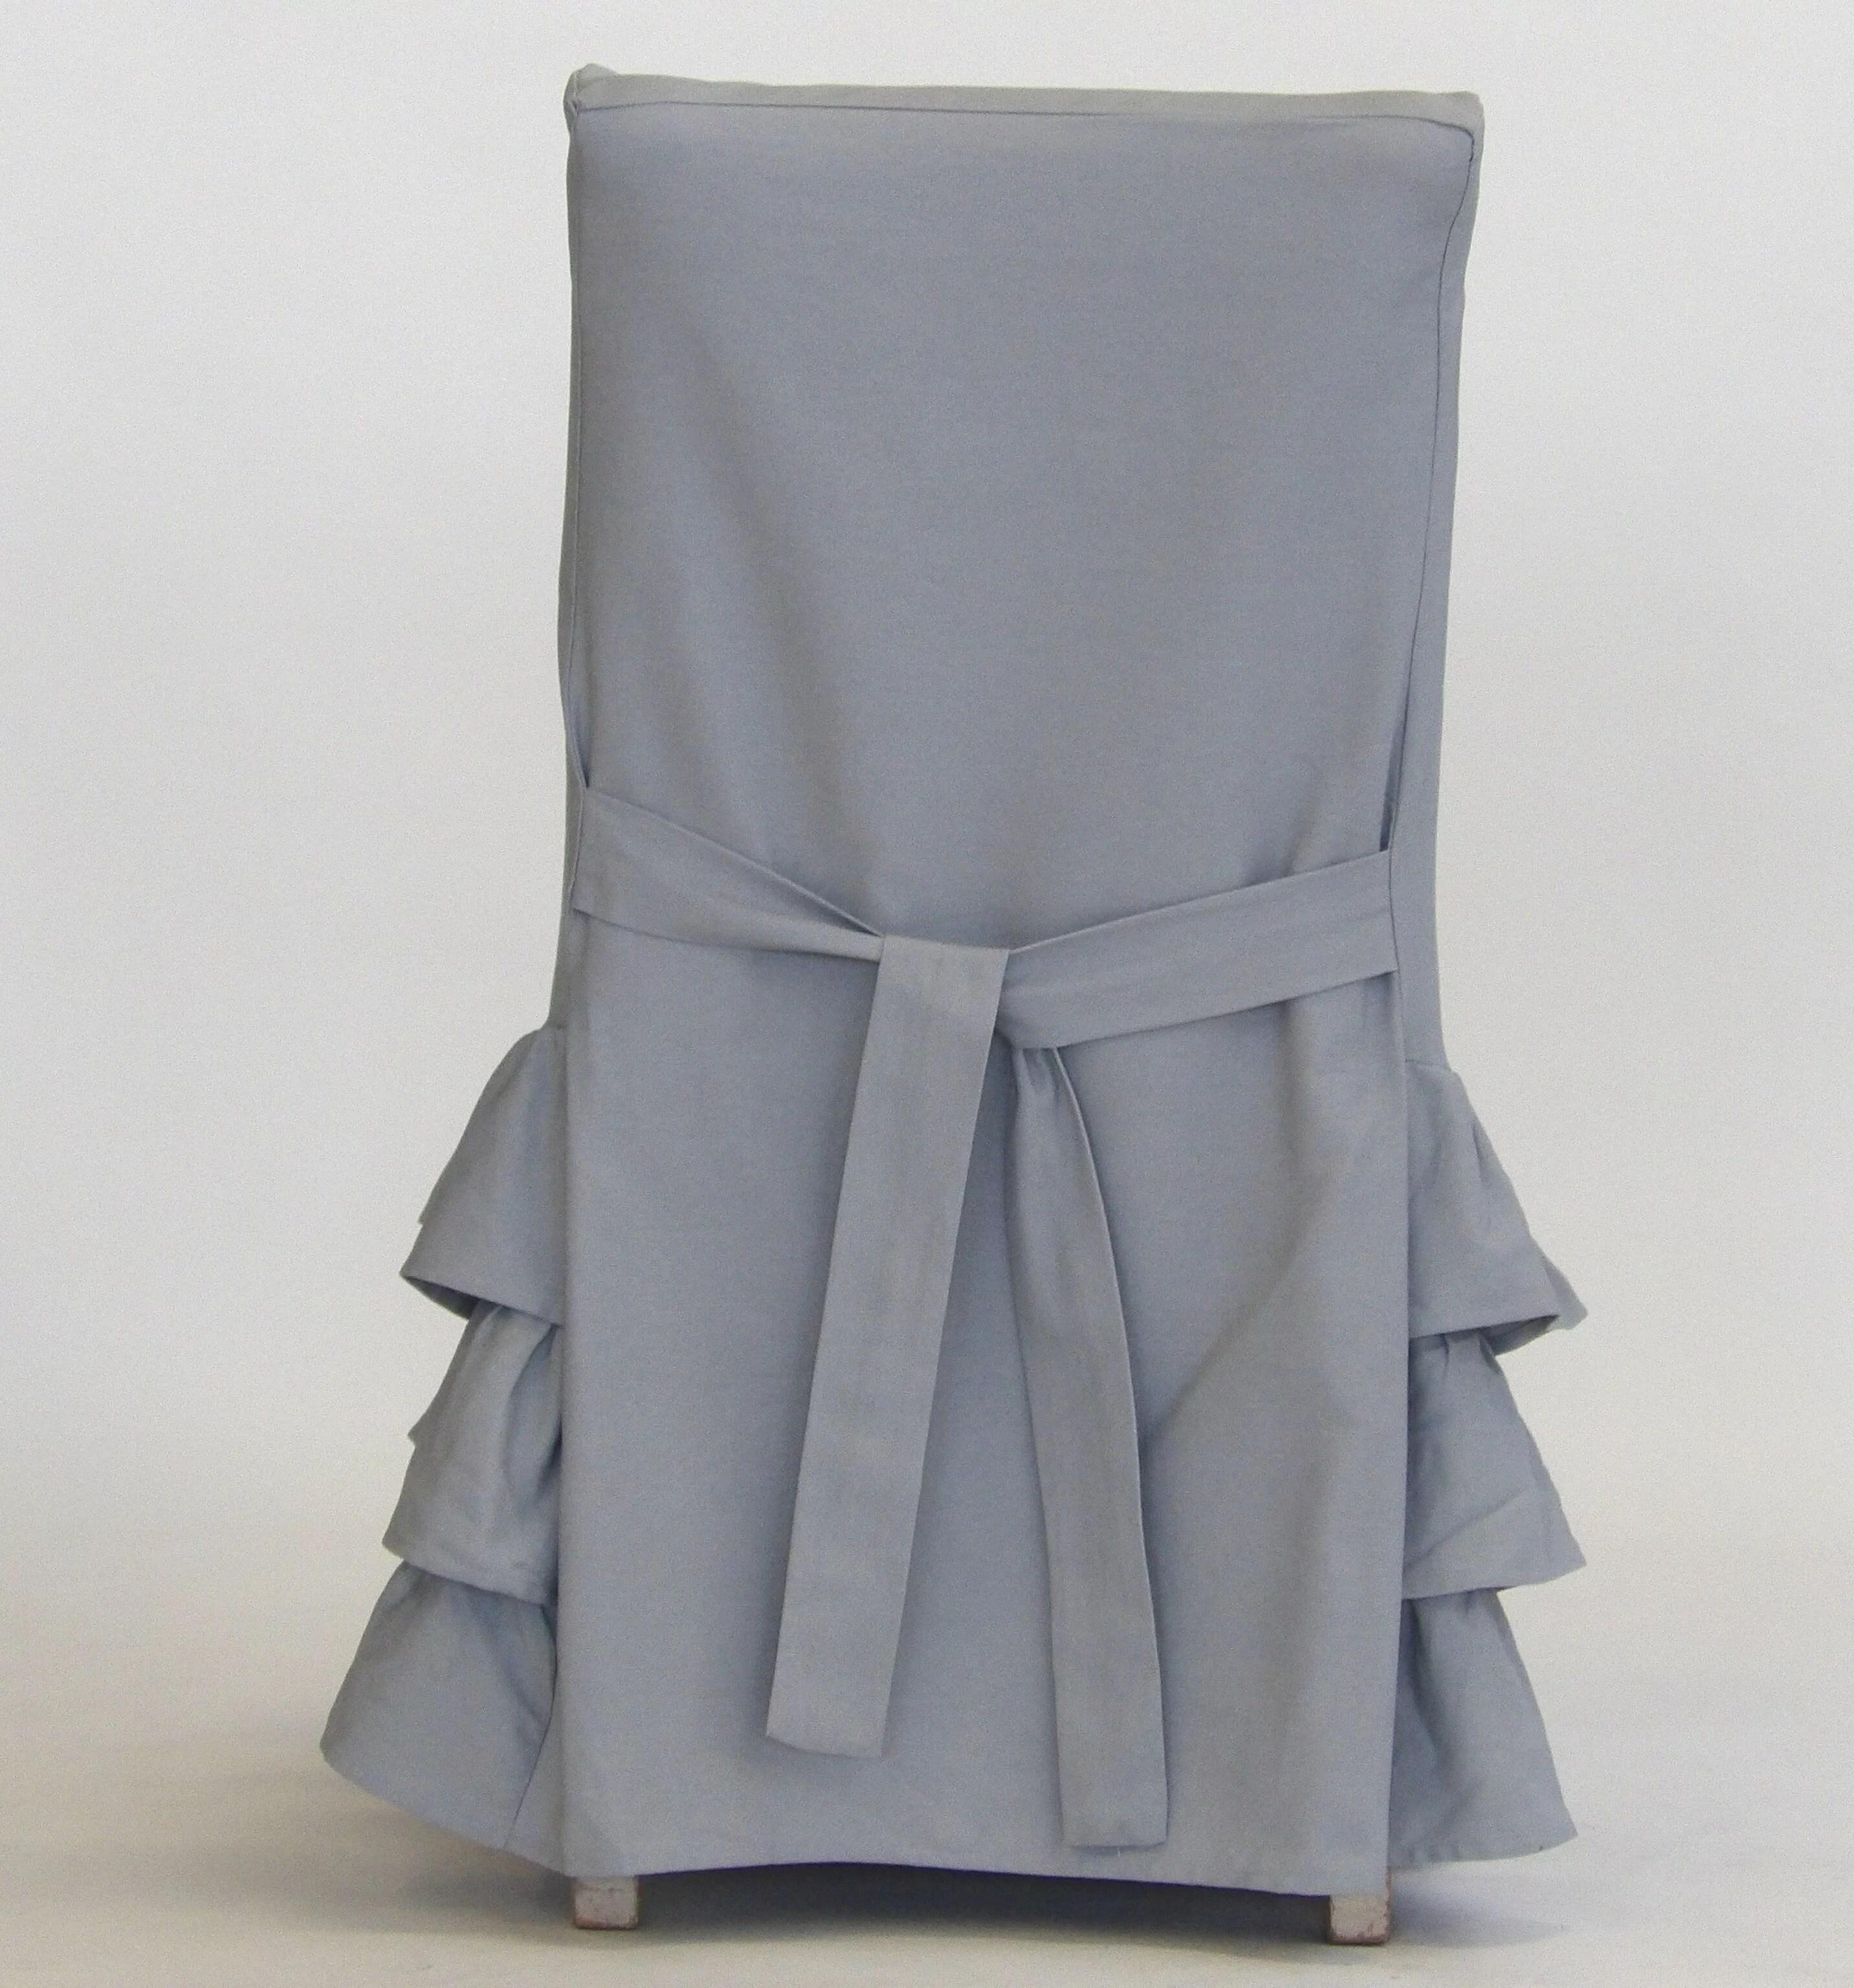 Parson Skirted Box Cushion Dining Chair Slipcover